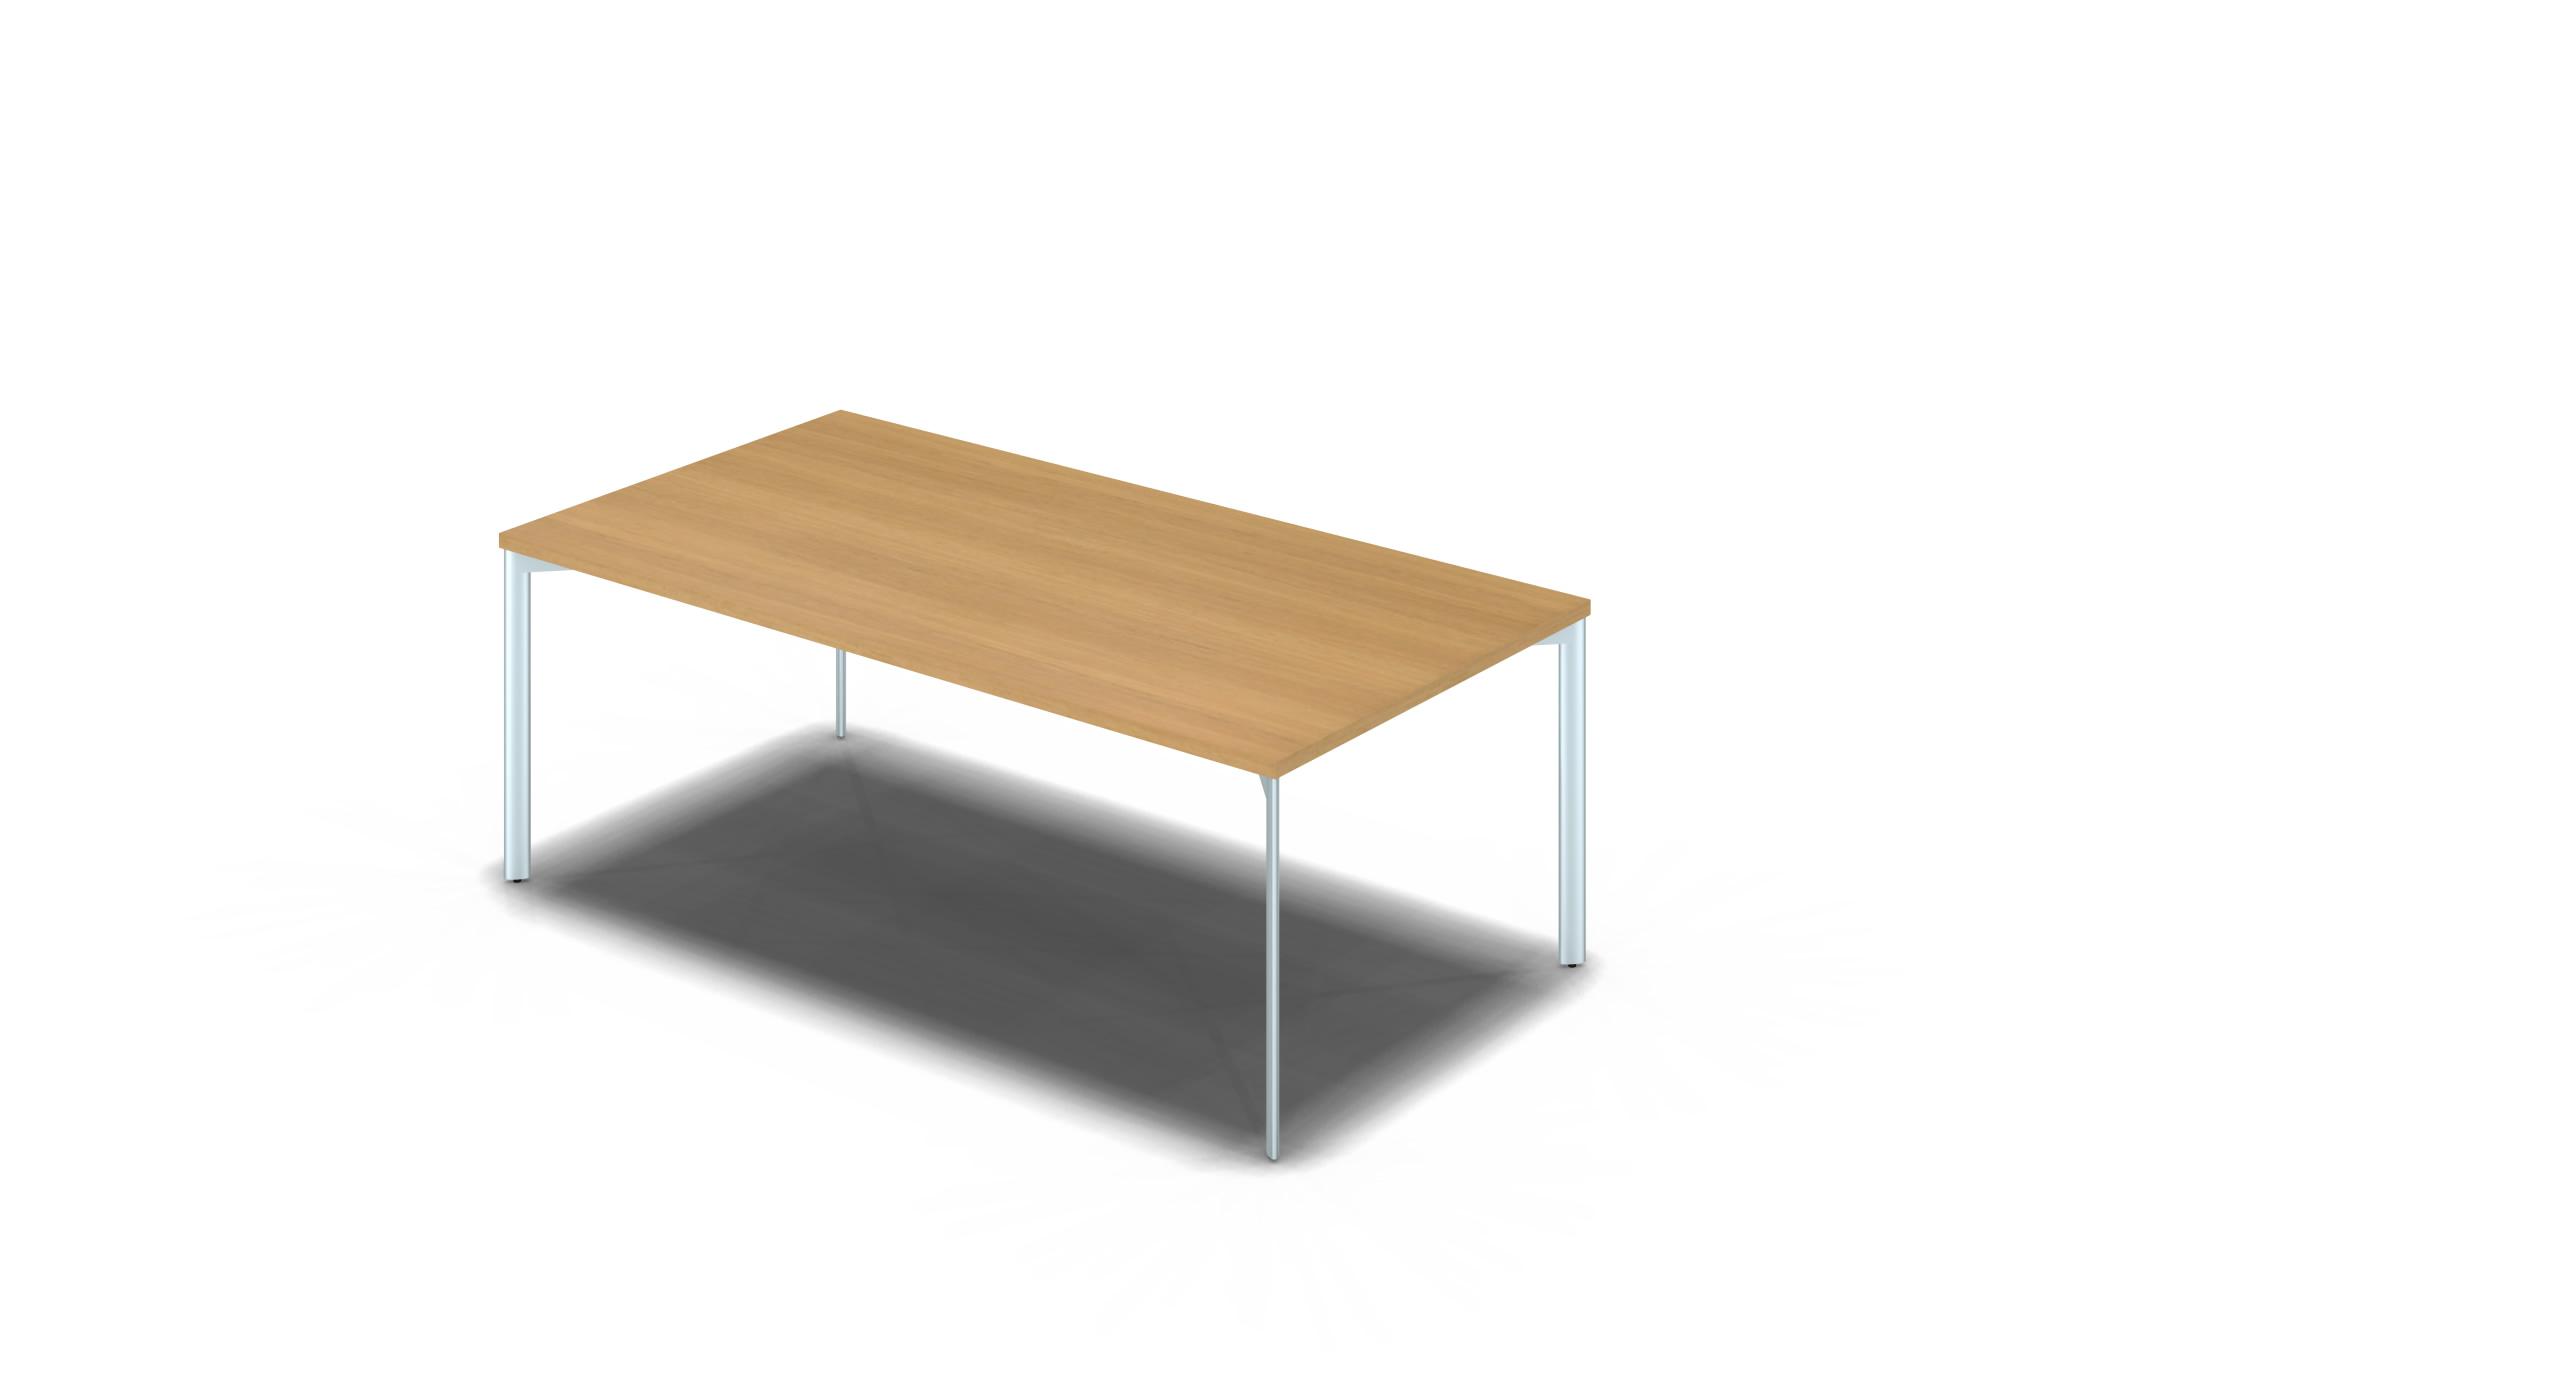 Table_Slim_1800x900_Silver_Oak_noOption